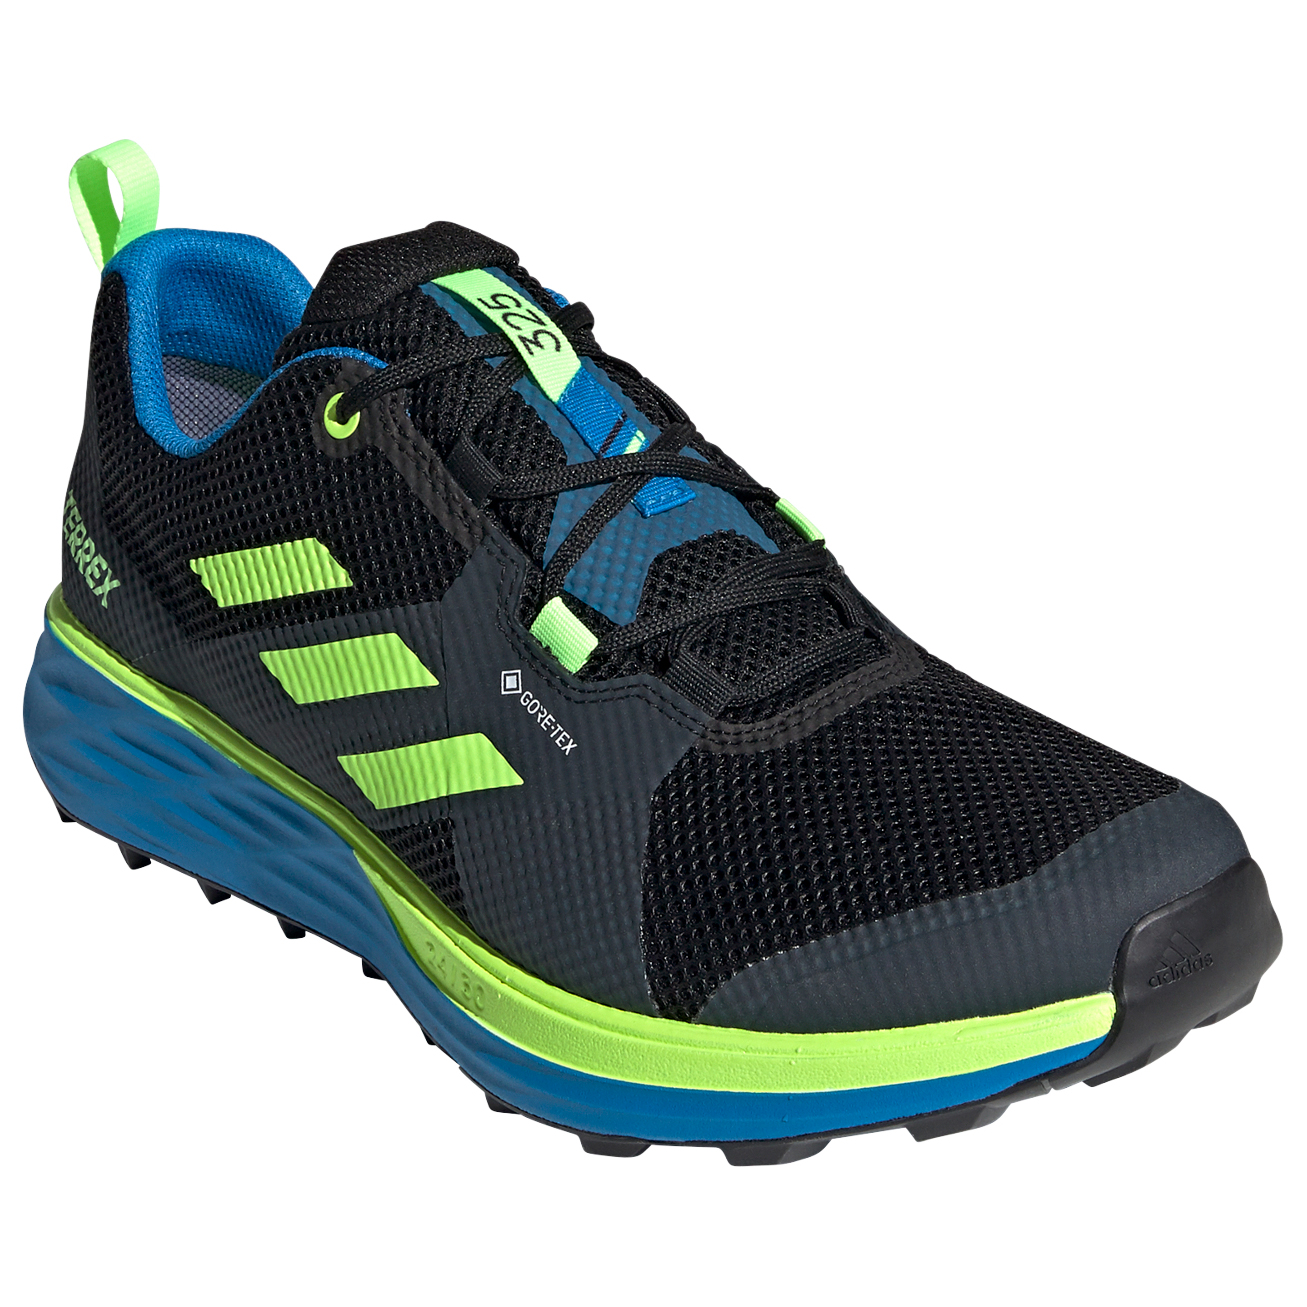 adidas - Terrex Two GTX - Trail running shoes